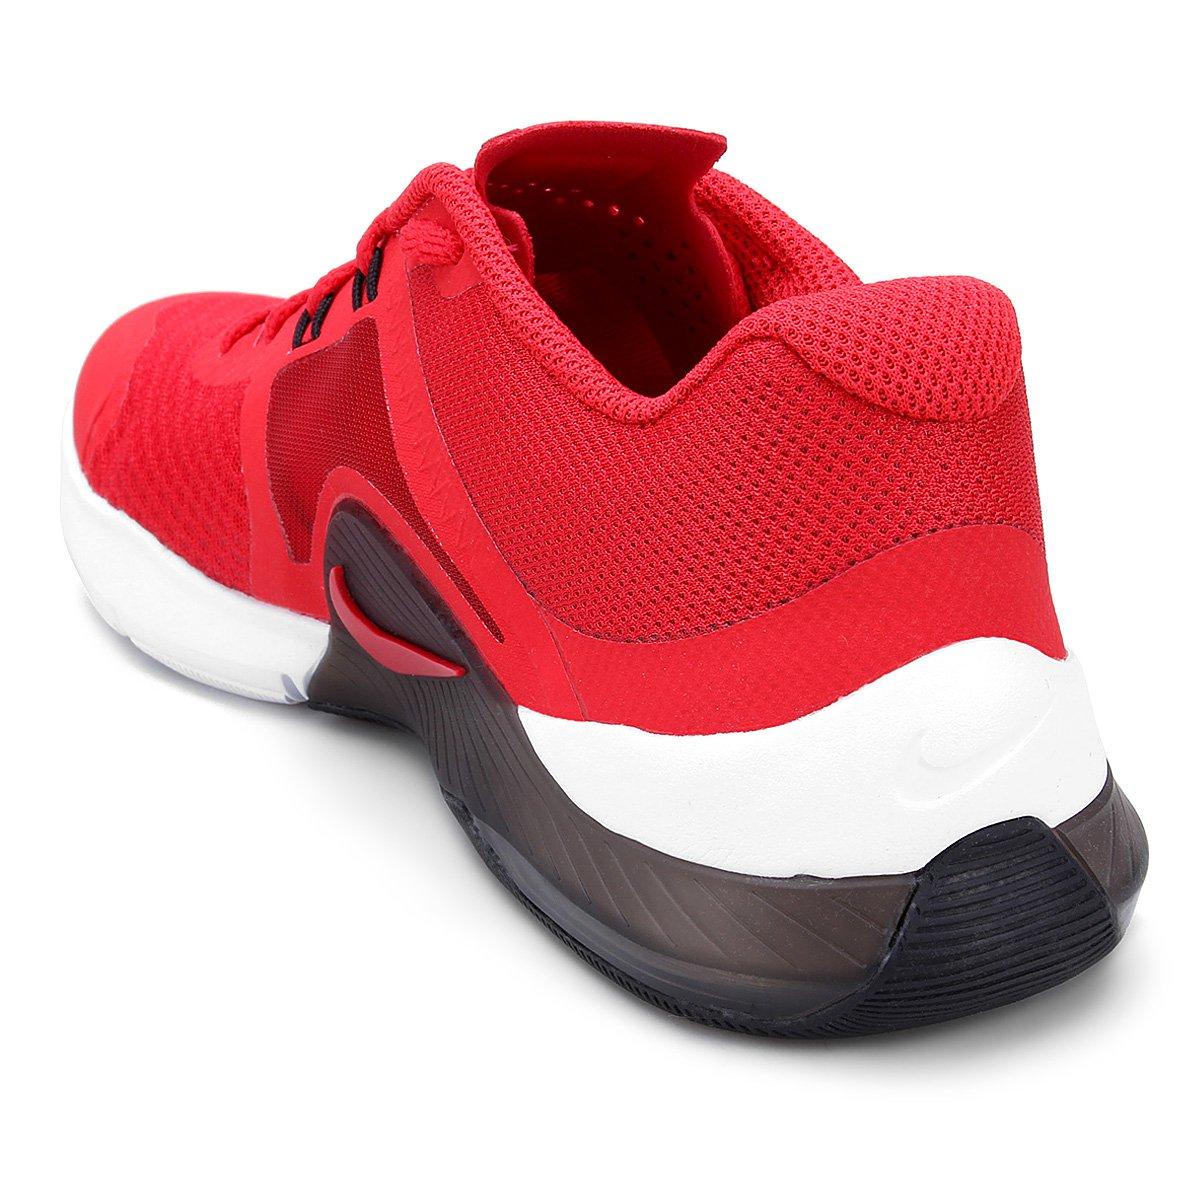 9e0ada6dae Tênis Nike Zoom Train Complete 2 Masculino - Vermelho e Preto ...